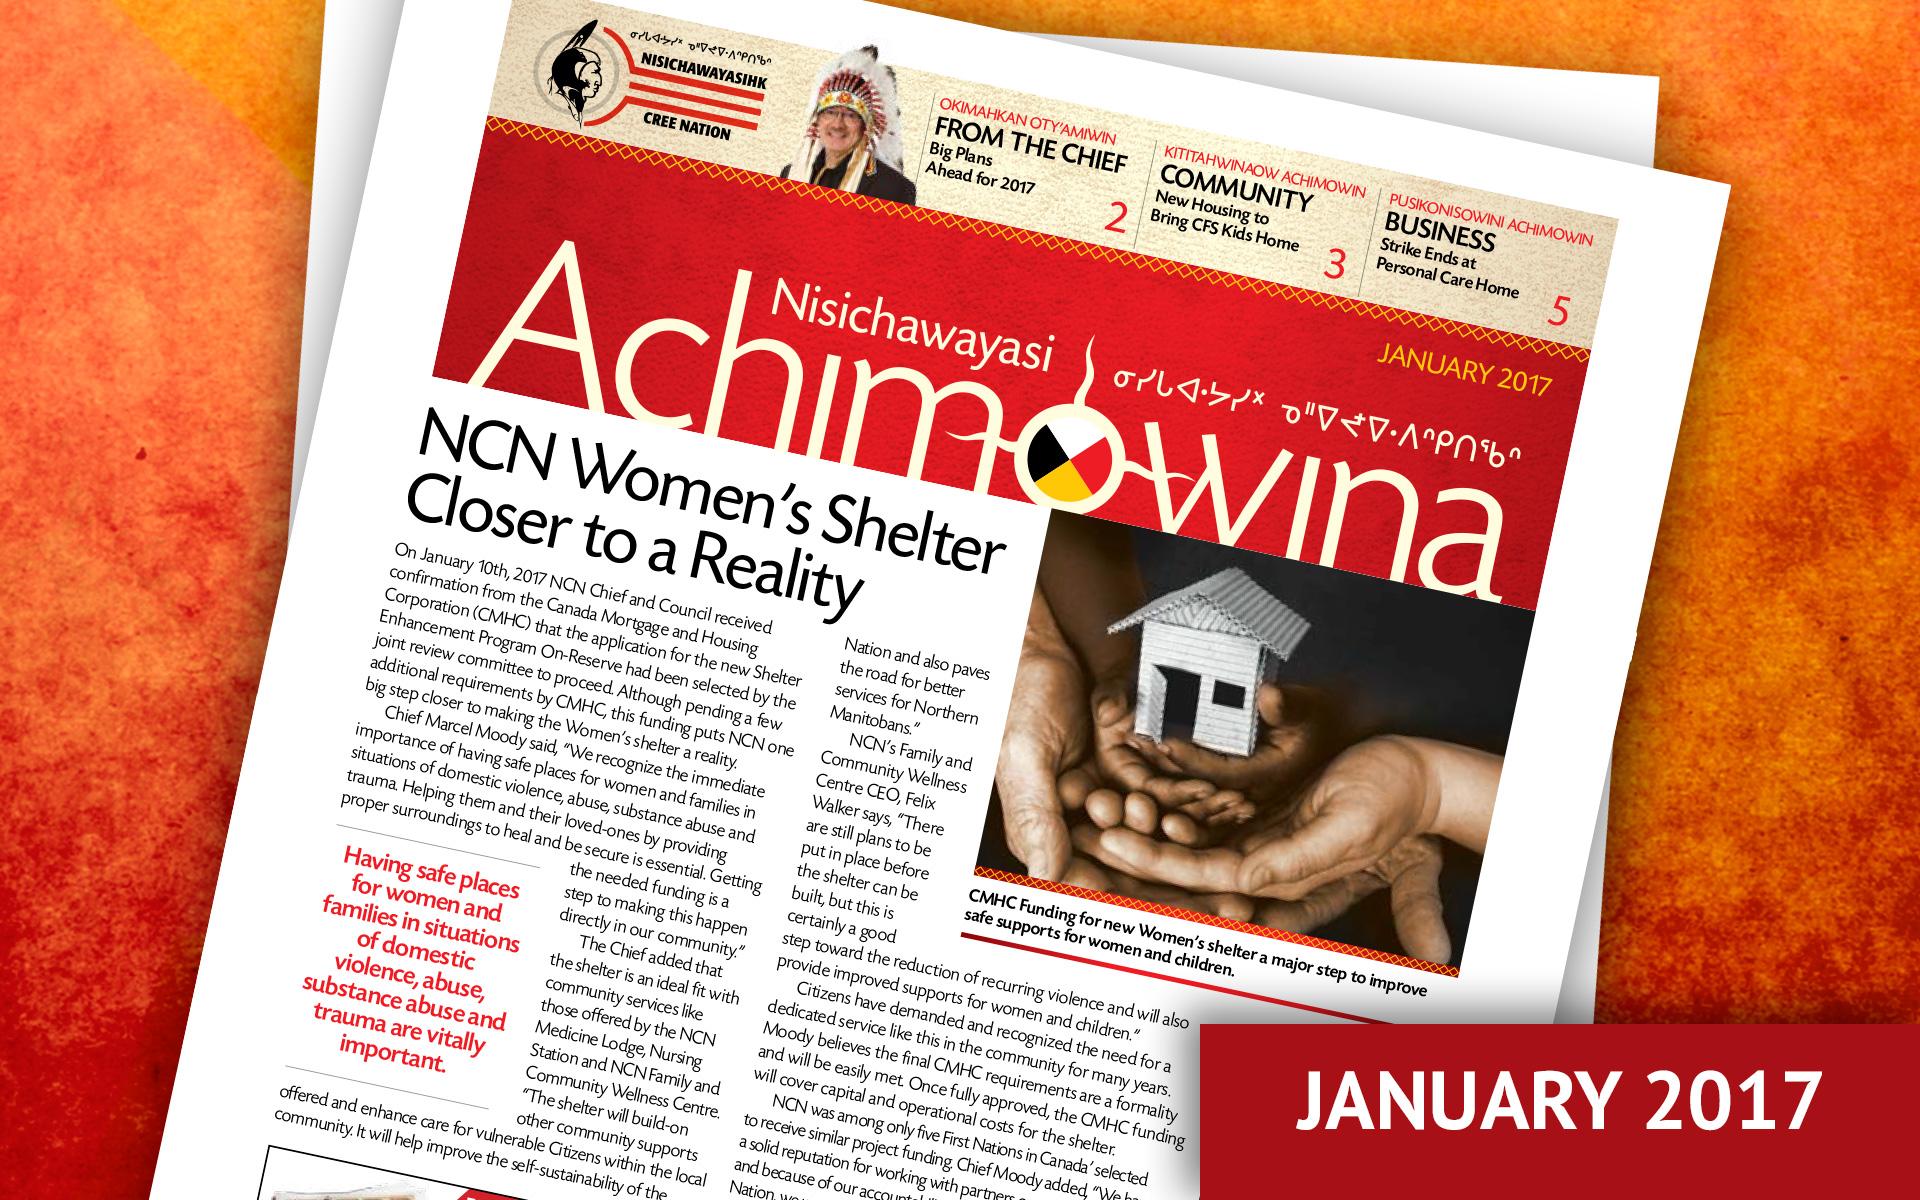 Achimowina January 2017 - NCN Women's Shelter Closer to Reality